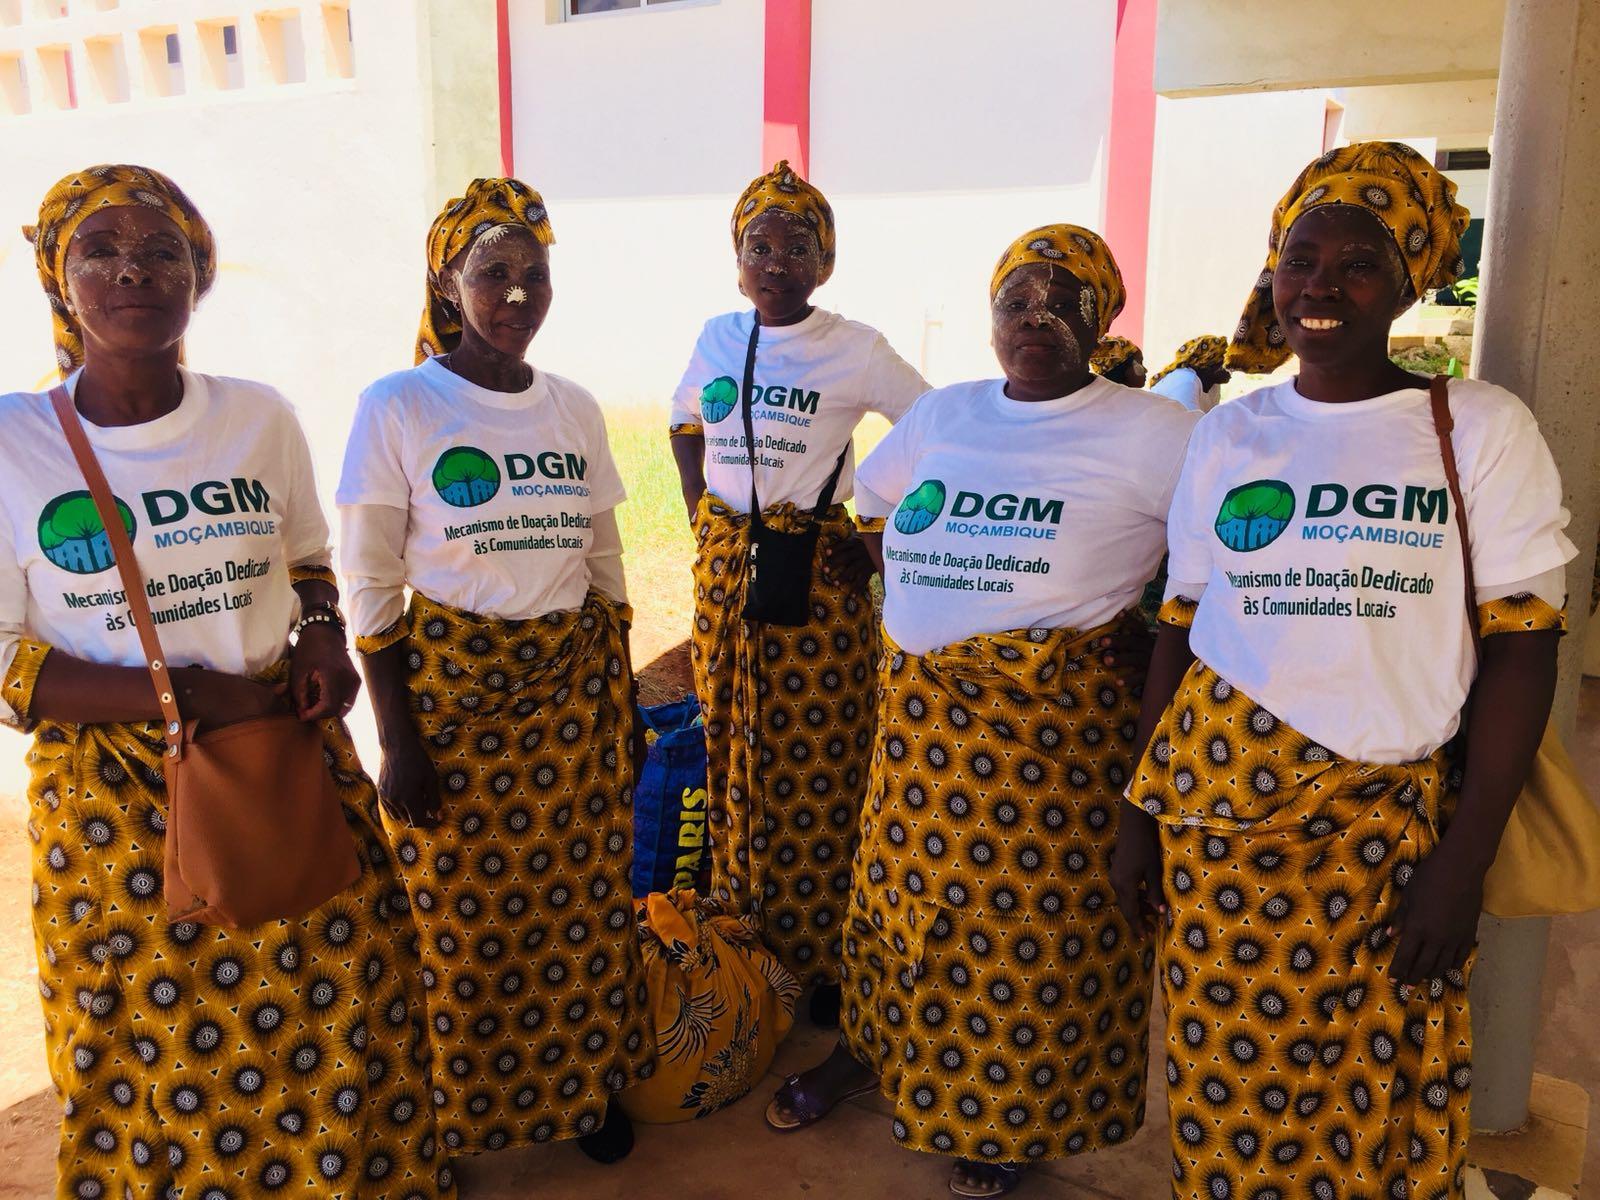 Local communities participating at the launch of MozDGM in Pemba, the capital of Cabo Delgado Province in Mozambique's north.  Comunidades locais que participam no lançamento do MozDGM em Pemba, a capital da Província de Cabo Delgado no norte de Moçambique.